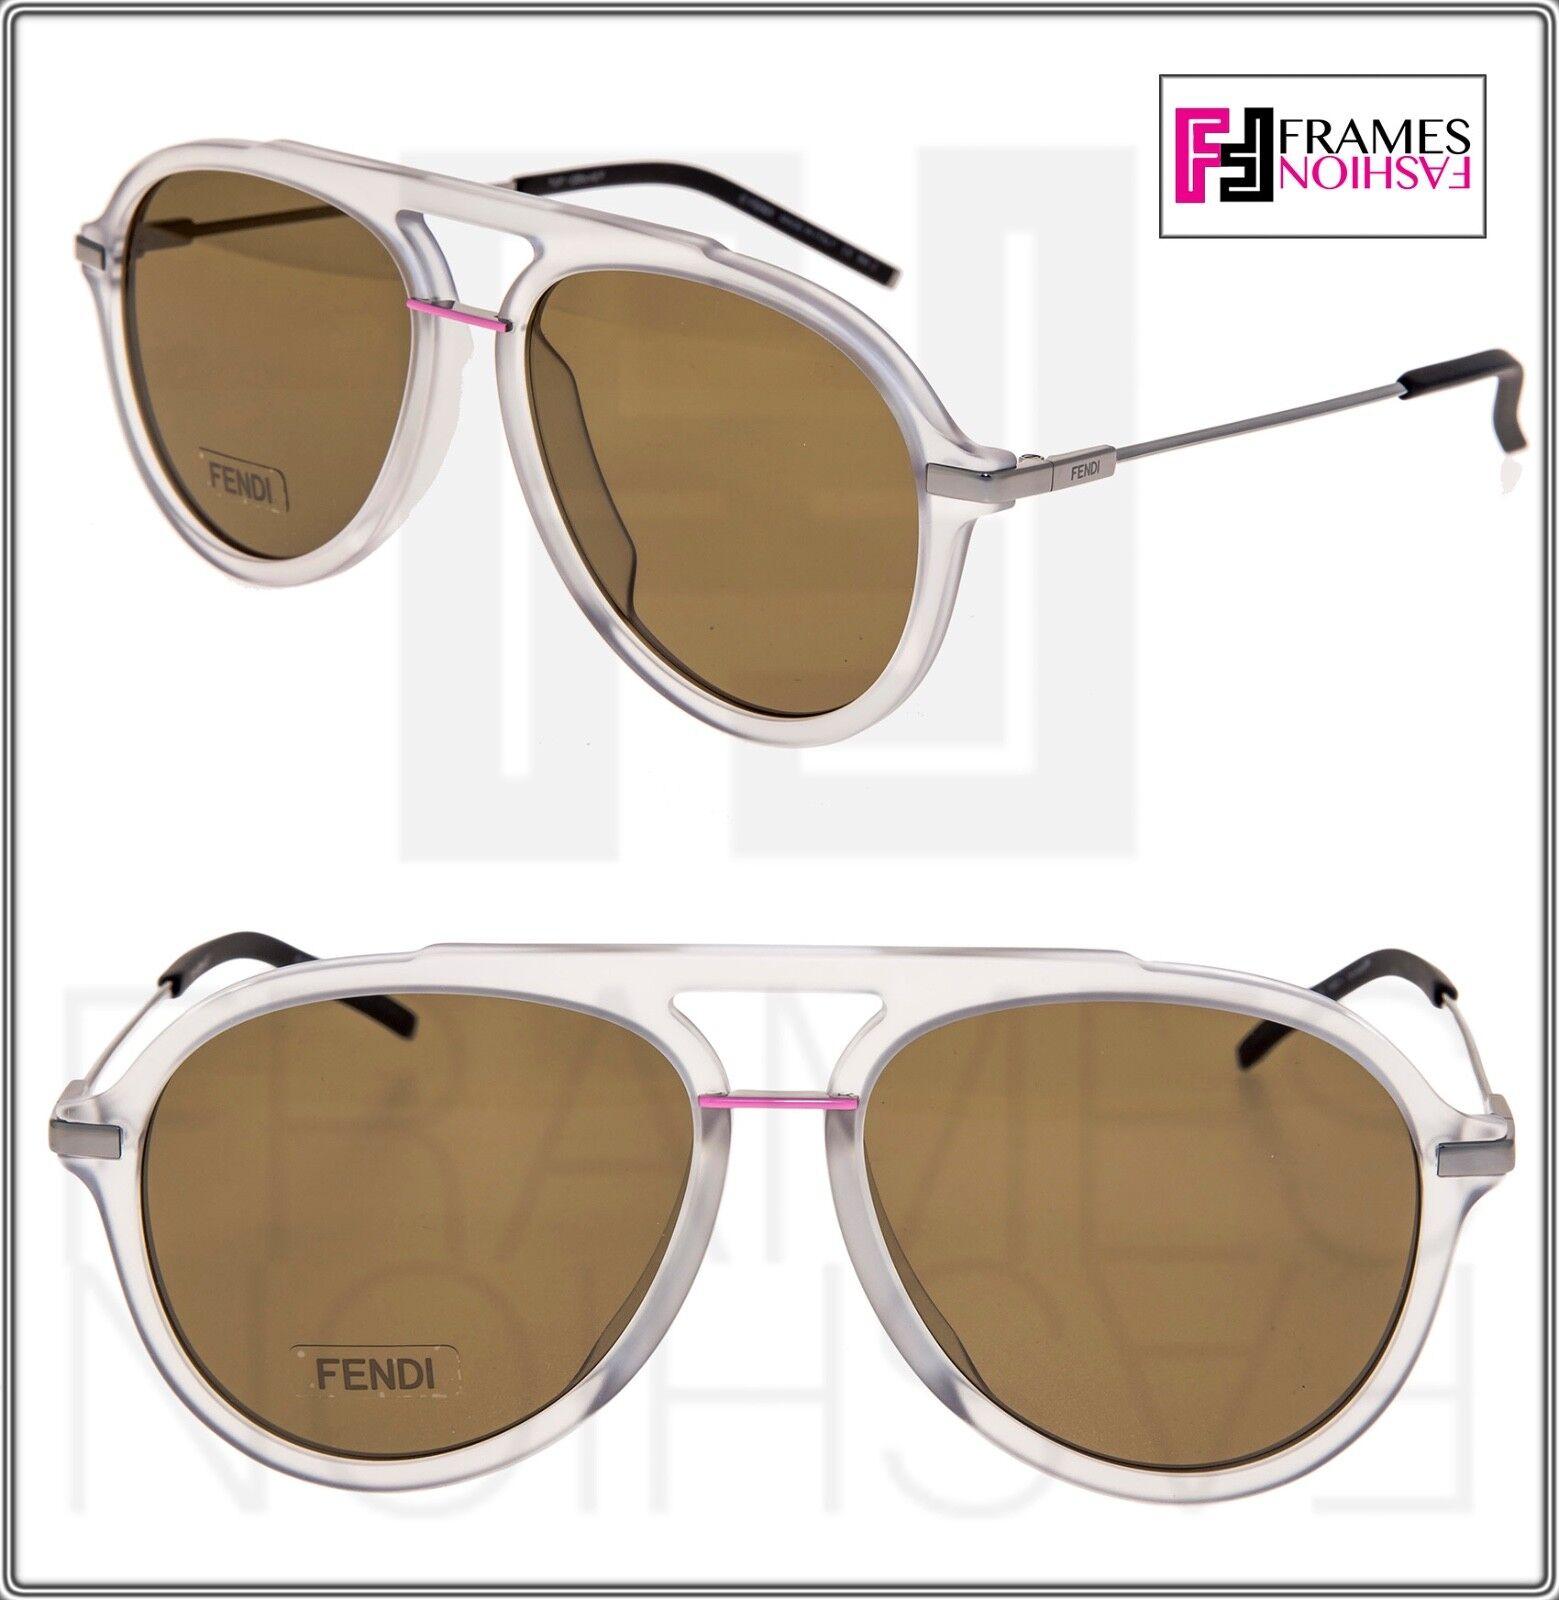 FENDI FANTASTIC FFM0011S Crystal Grey Pink Oversized Aviator Sunglasses 0011 Men